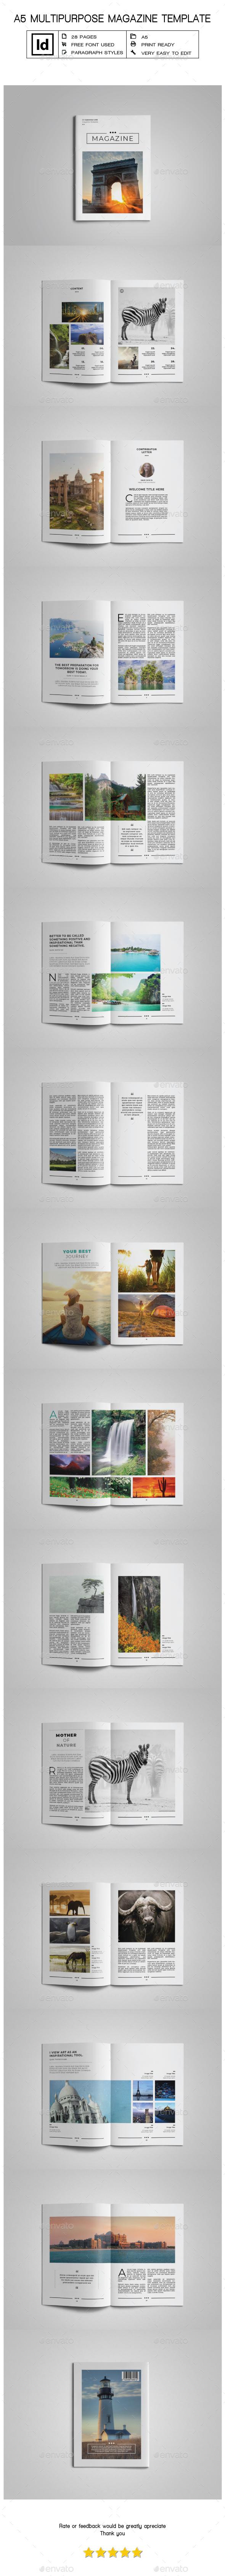 A5 Multipurpose Magazine Template IV - Magazines Print Templates